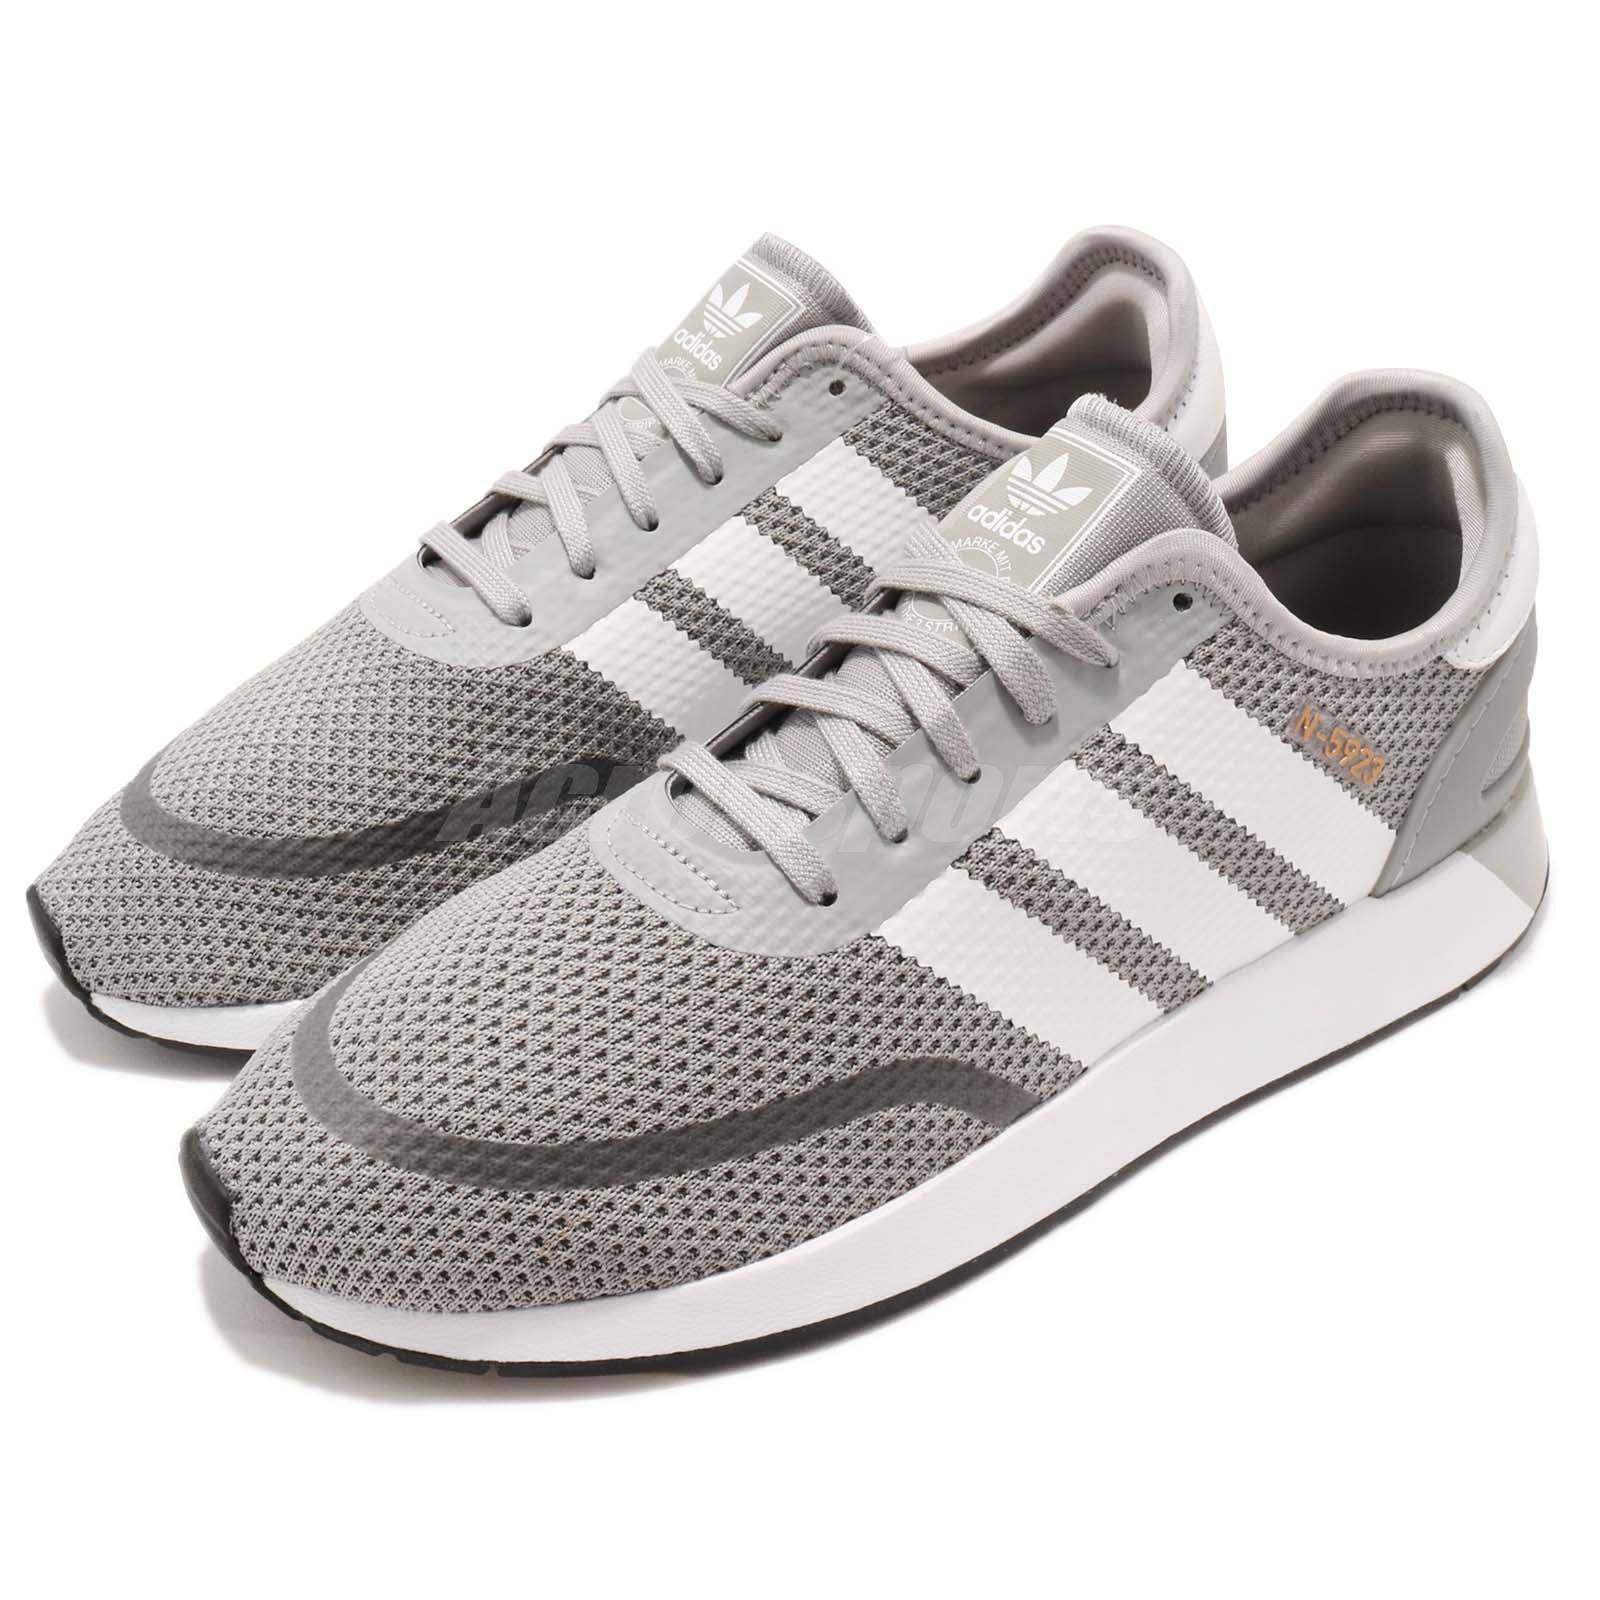 Adidas Originals N-5923 Iniki Runner Grey White Men Running shoes Sneaker CQ2334